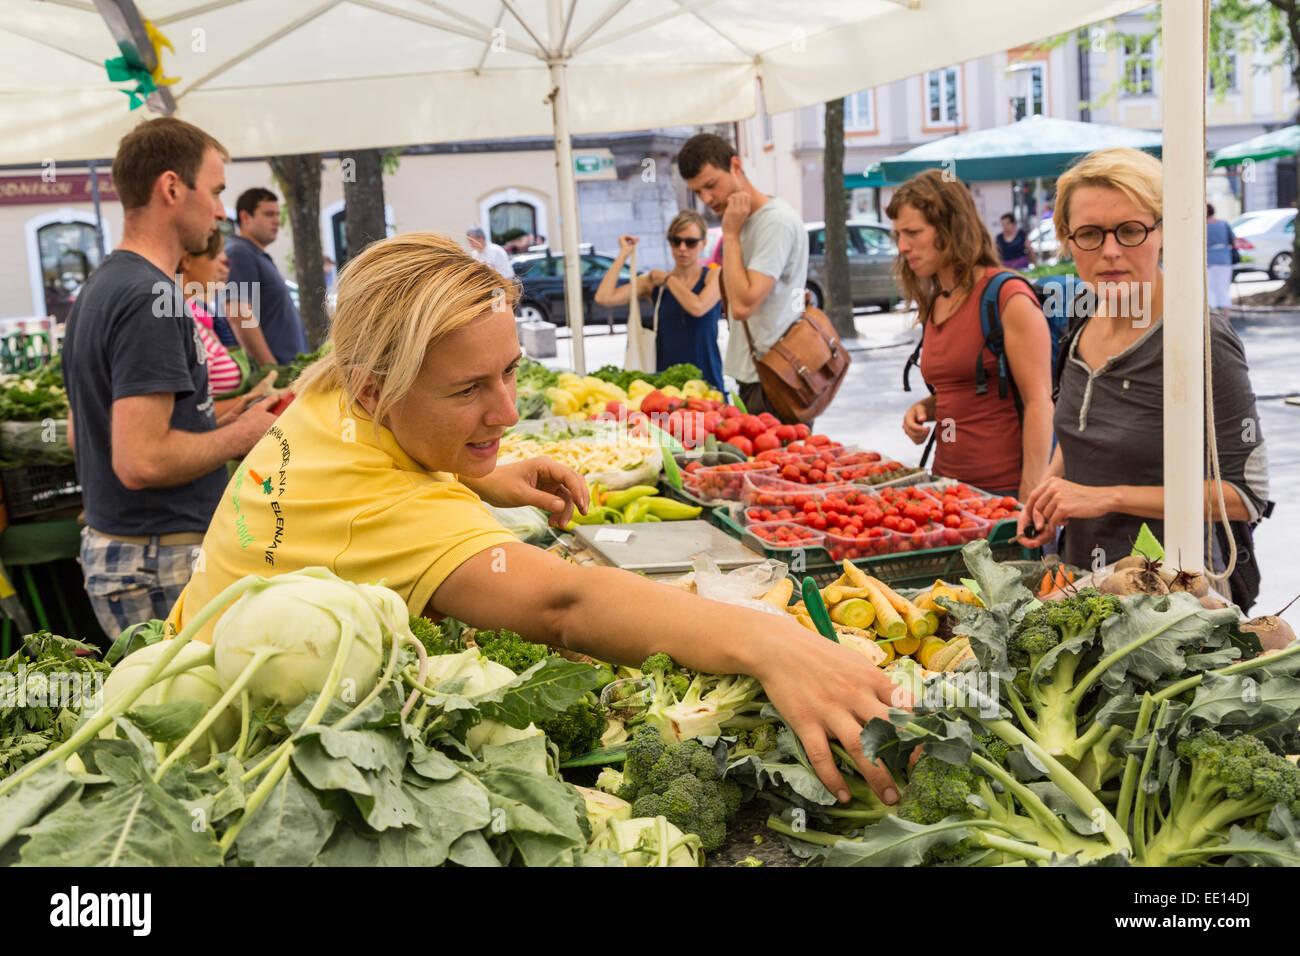 Market stall selling vegetables, Ljubljana, Slovenia - Stock Image